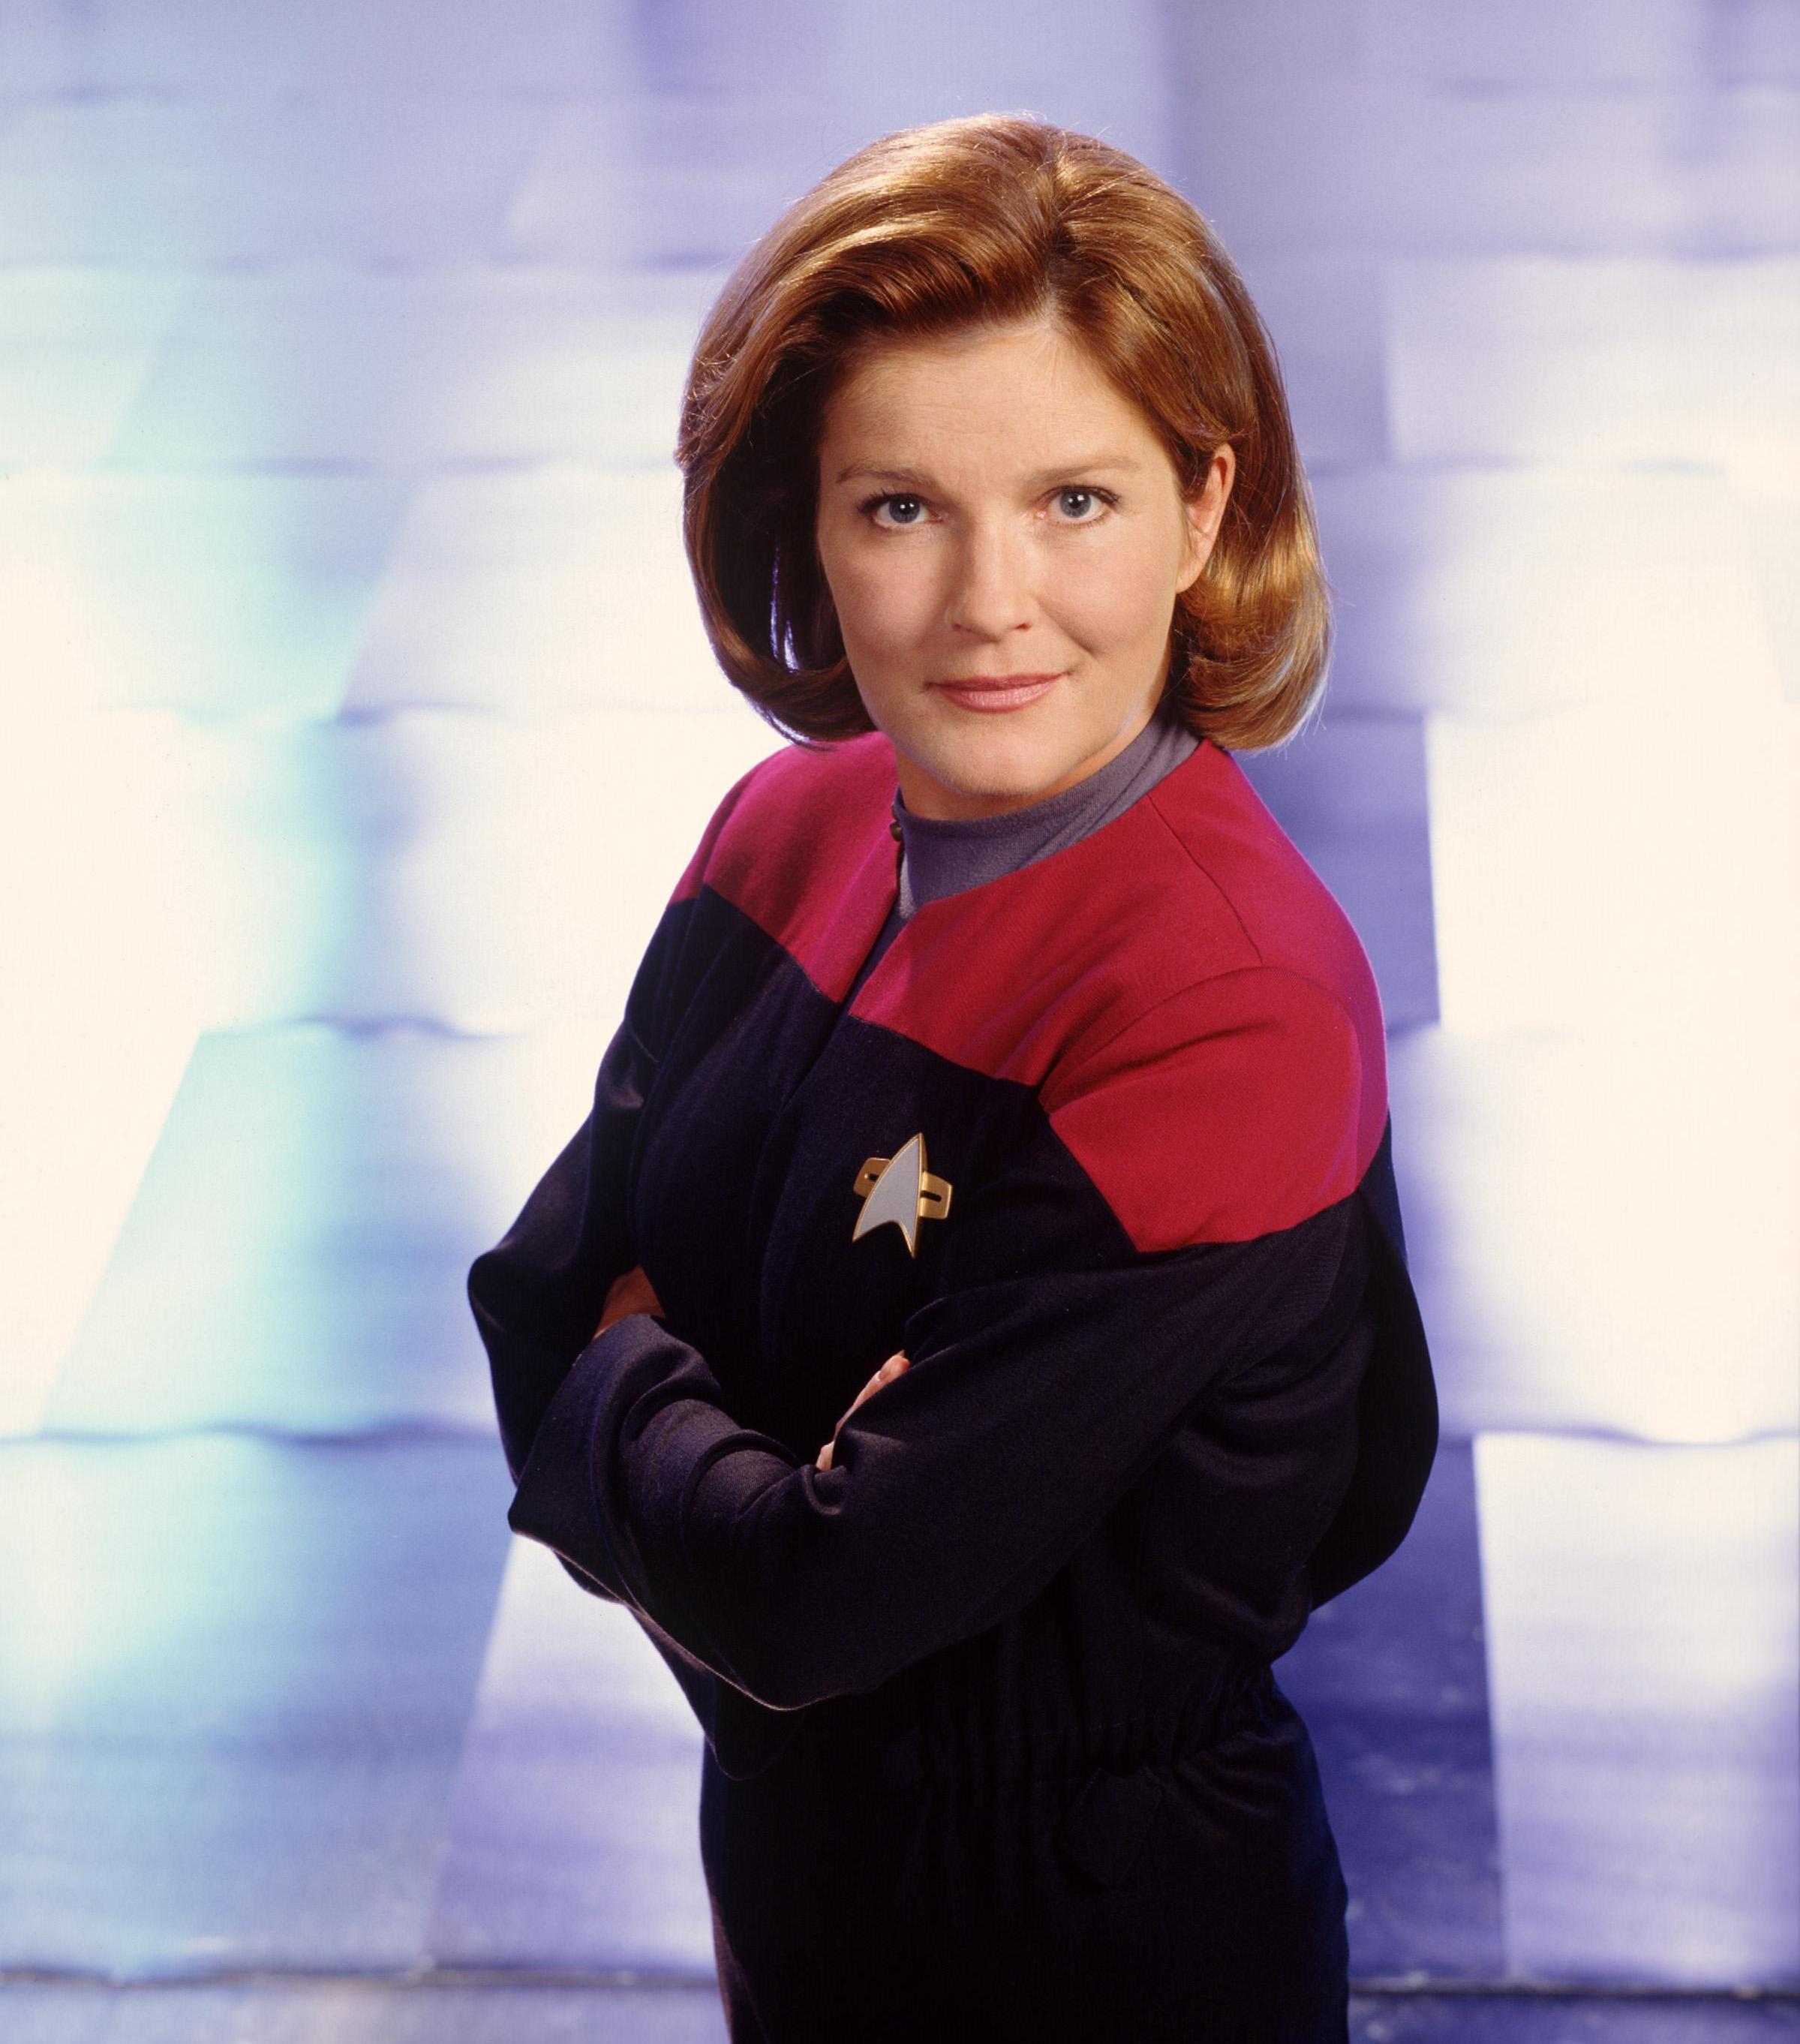 Kate Mulgrew captain janeway